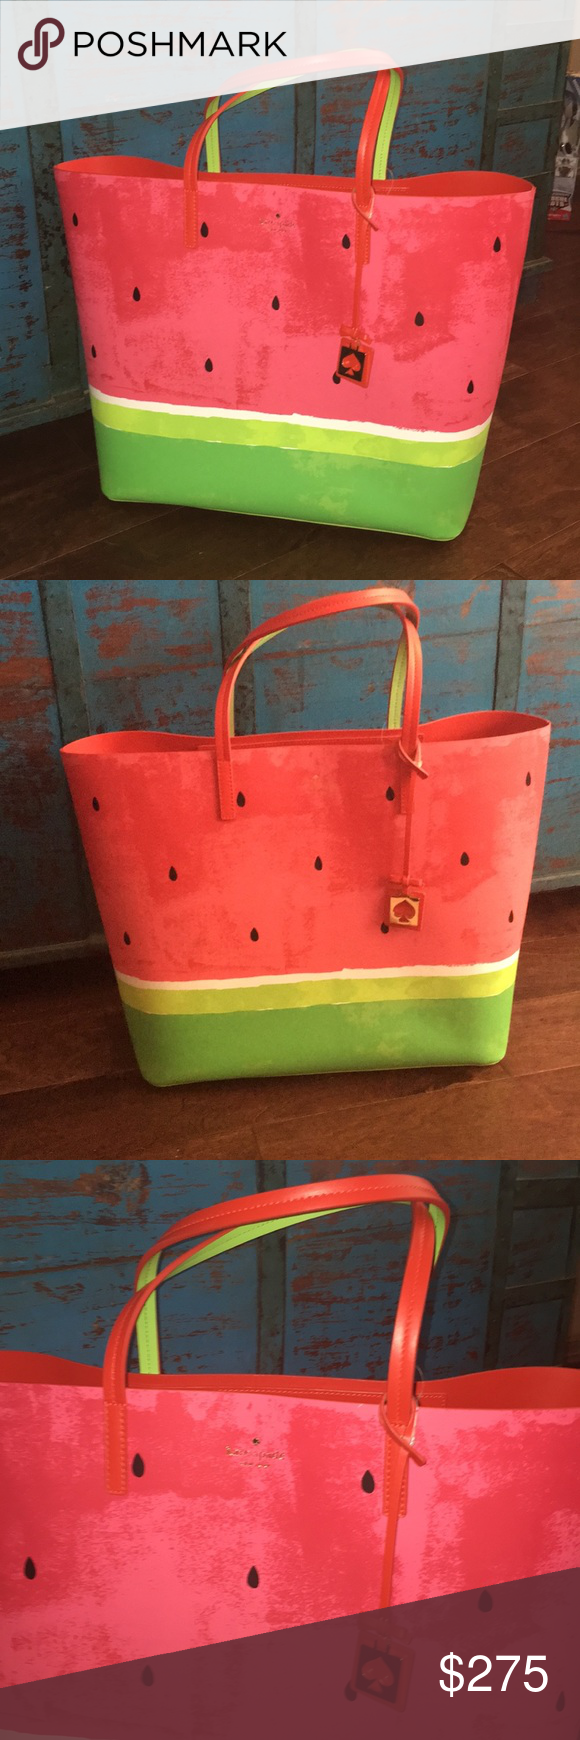 Kate Spade Make A Splash Watermelon Tote Nwt